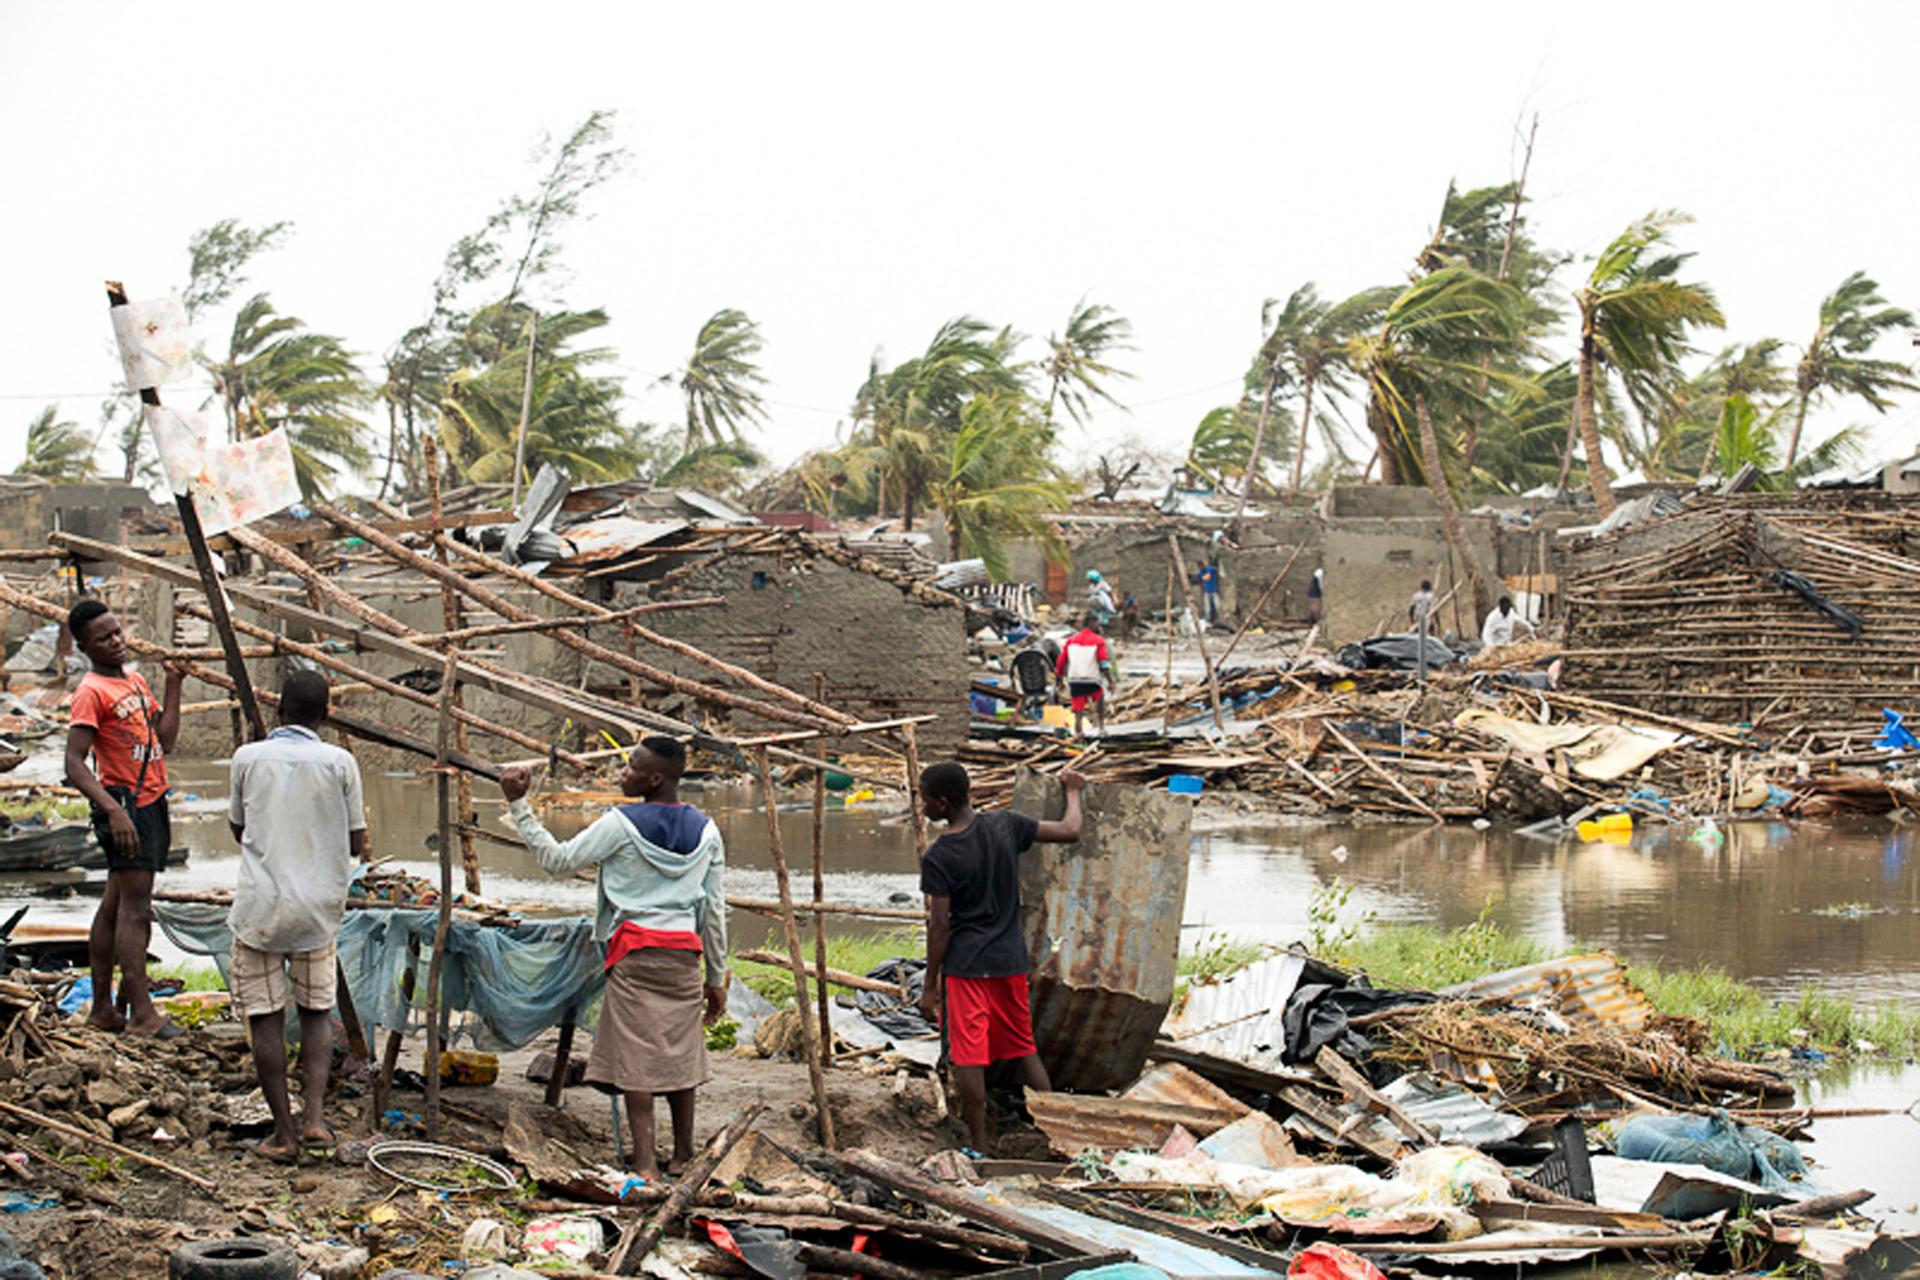 Fears of massive death toll as Mozambique, Zimbabwe survey damage of Cyclone Idai